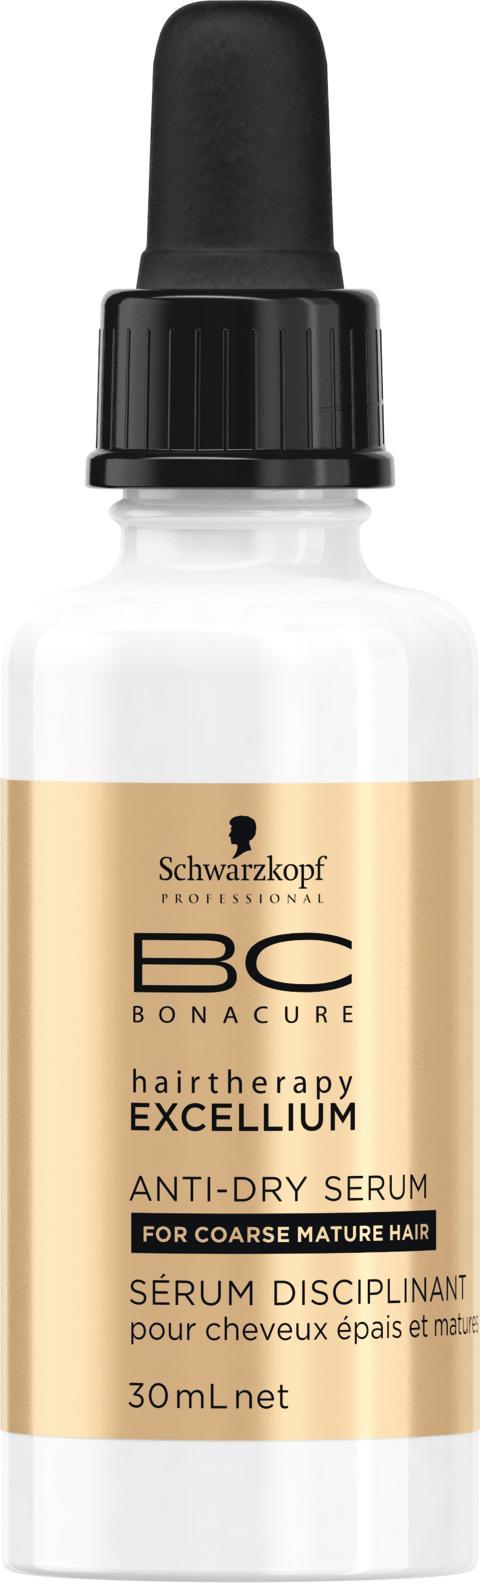 Schwarzkopf BC Excellium - Taming Anti-Dry Serum